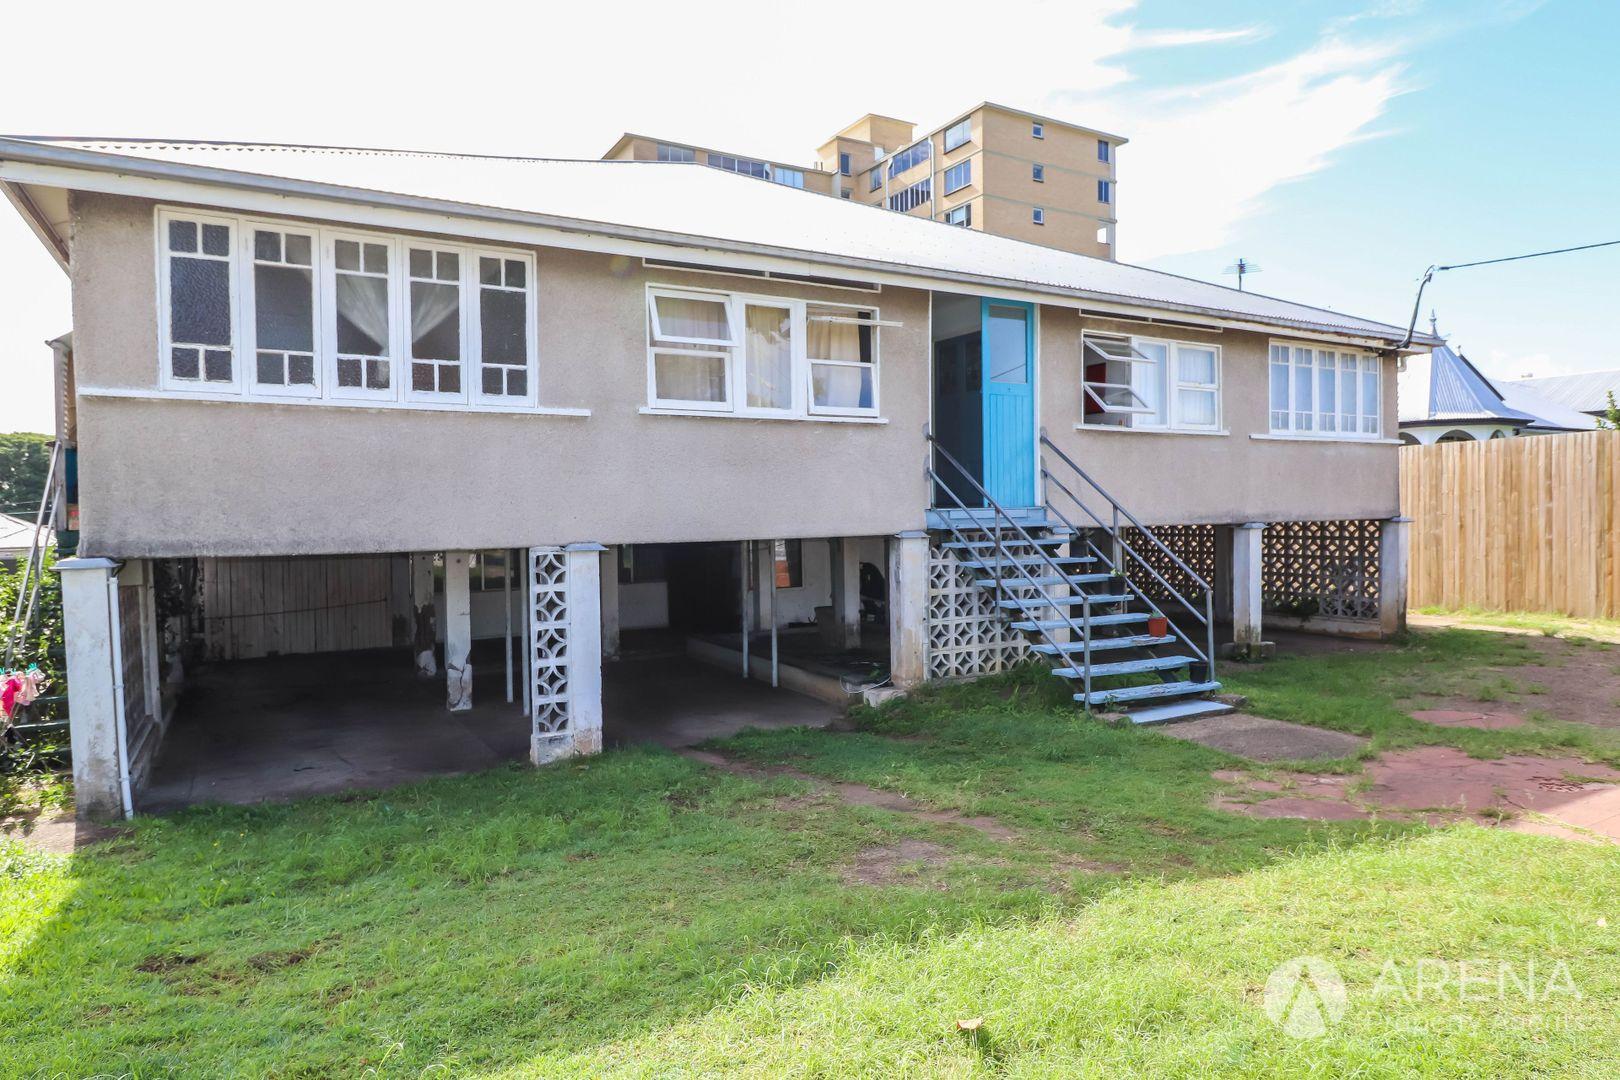 2/228 Moray Street, New Farm QLD 4005, Image 0